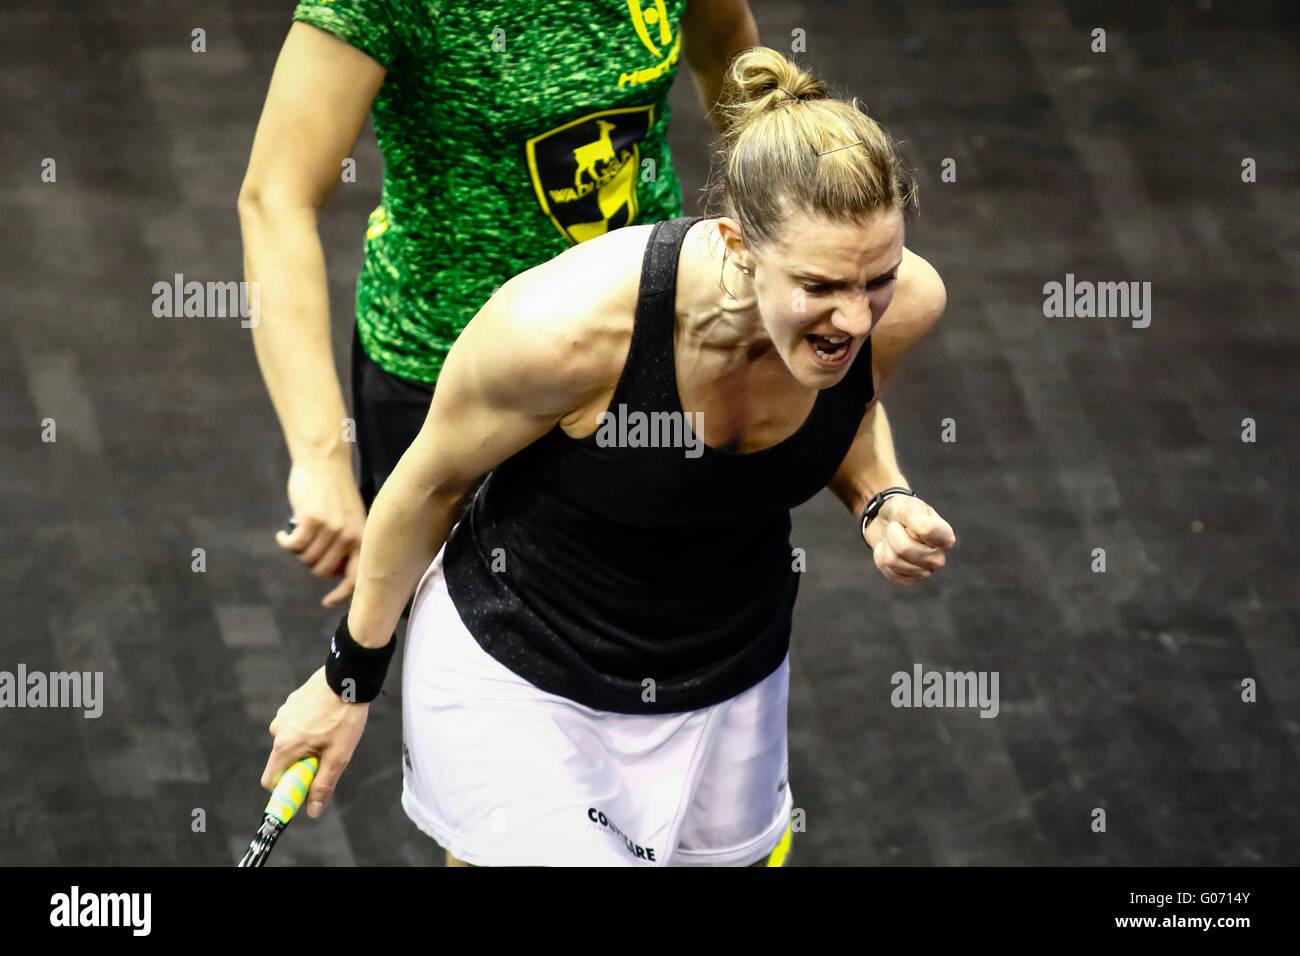 Kuala Lumpur, Malaysia. 29th Apr, 2016. British's Laura Massaro roars into the finals at the Women's World - Stock Image